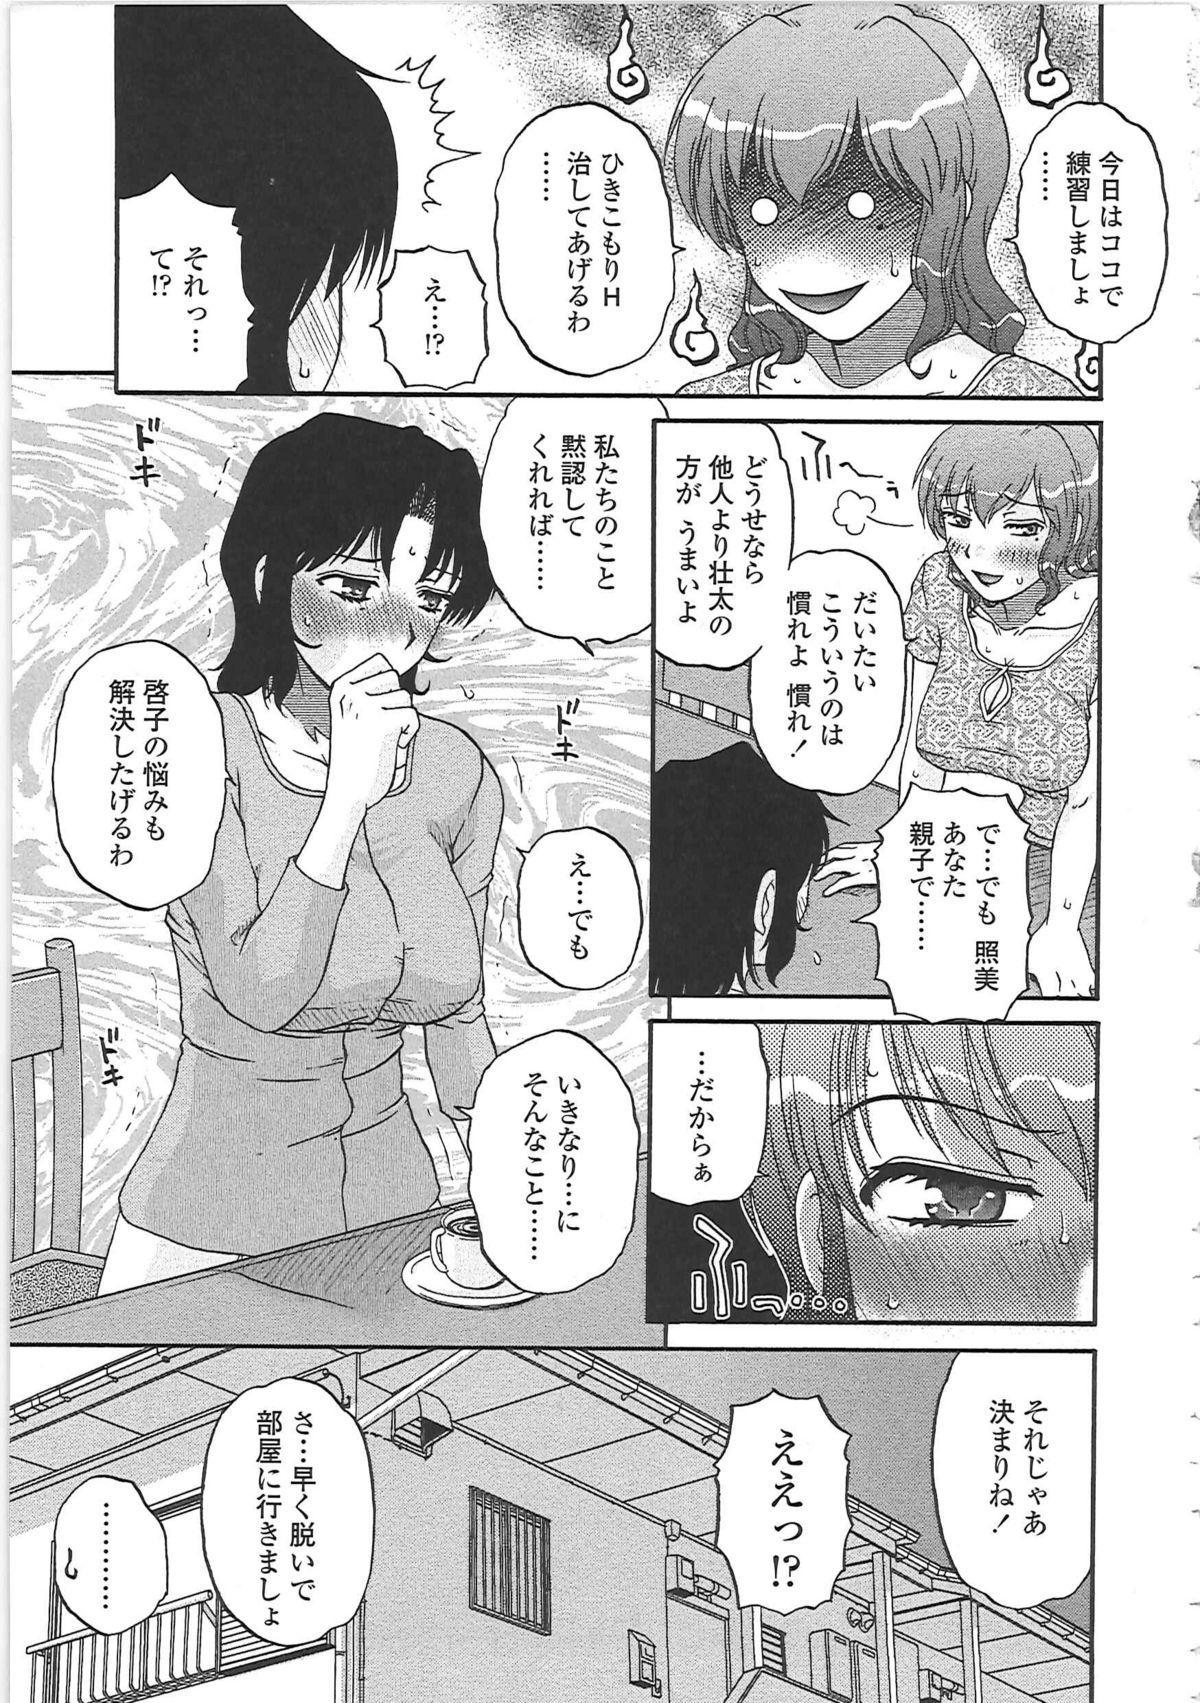 Nikuzuma Tsuushin - Erotic Wife Communication 31